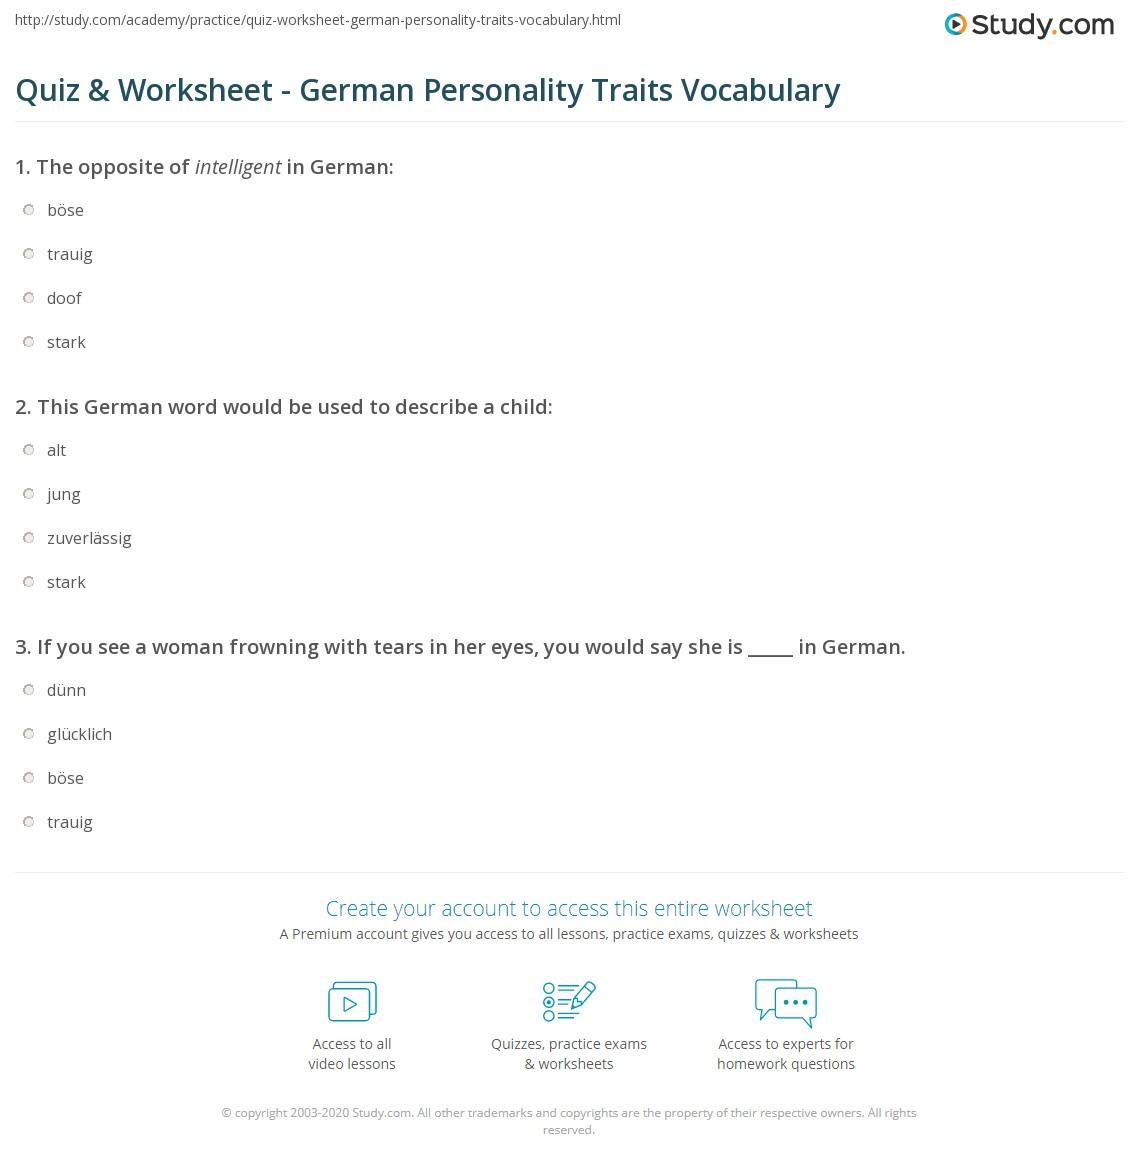 quiz worksheet german personality traits vocabulary study com